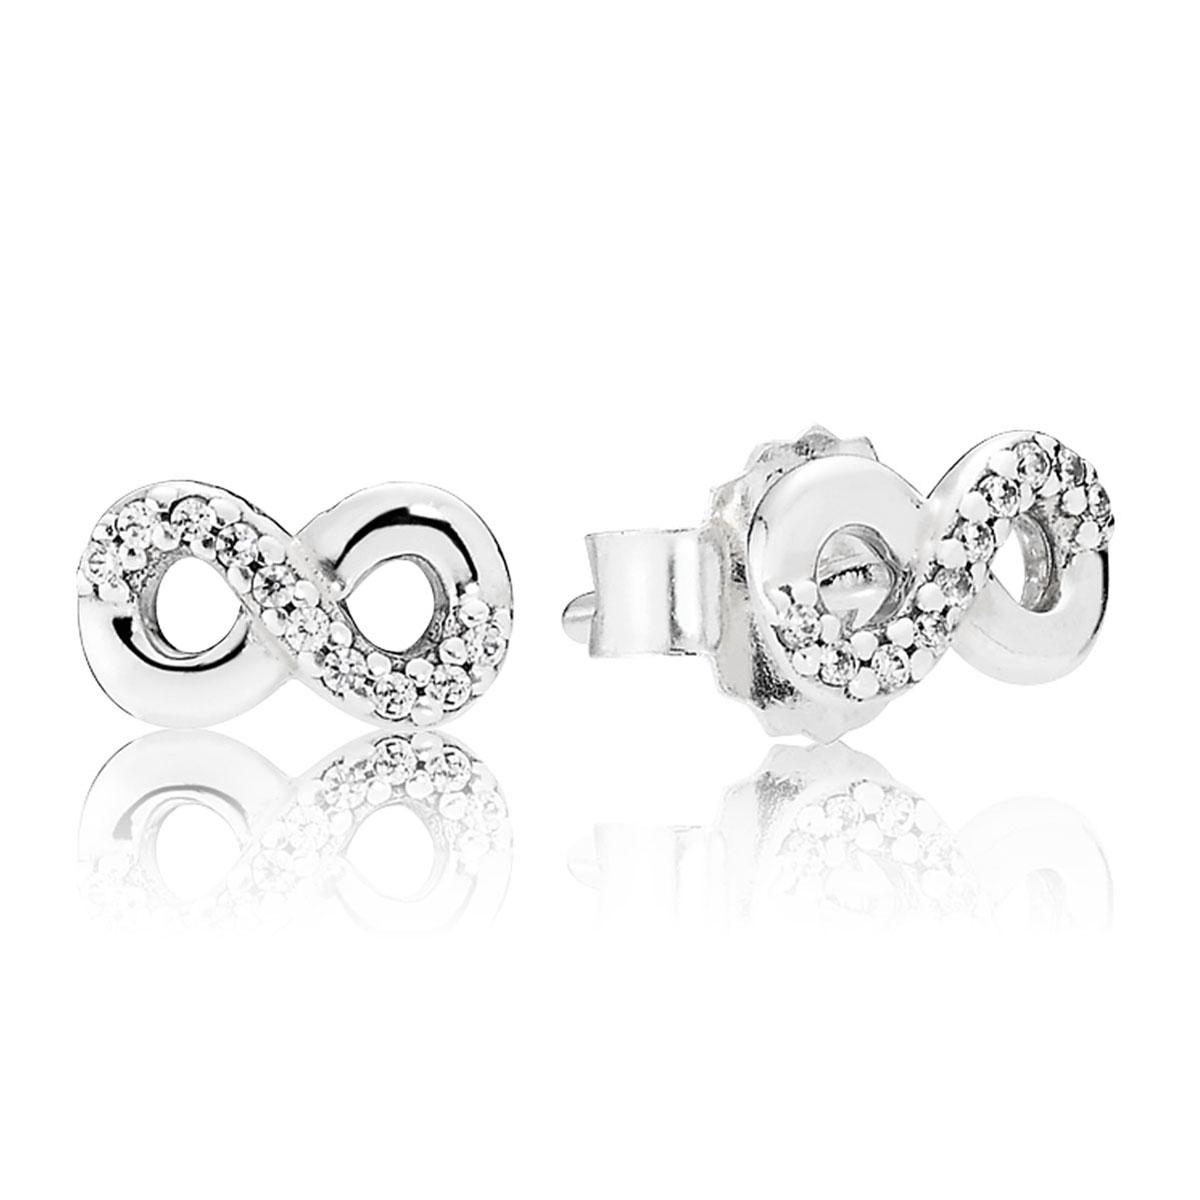 40bb66612 promo code for pandora earrings pancharmbracelets f010f 49c27